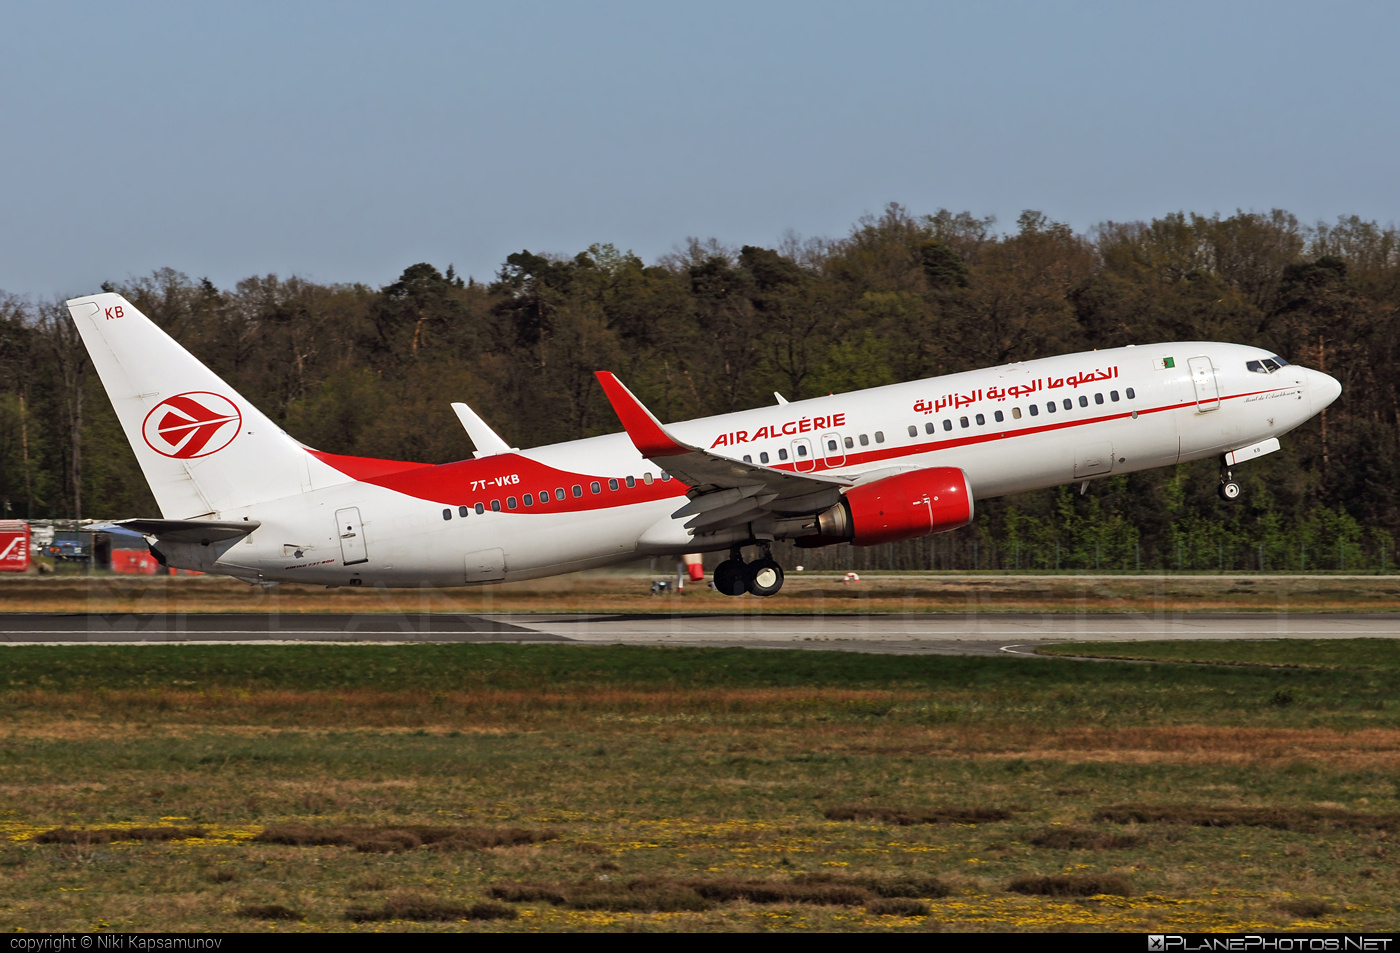 Boeing 737-800 - 7T-VKB operated by Air Algerie #b737 #b737nextgen #b737ng #boeing #boeing737